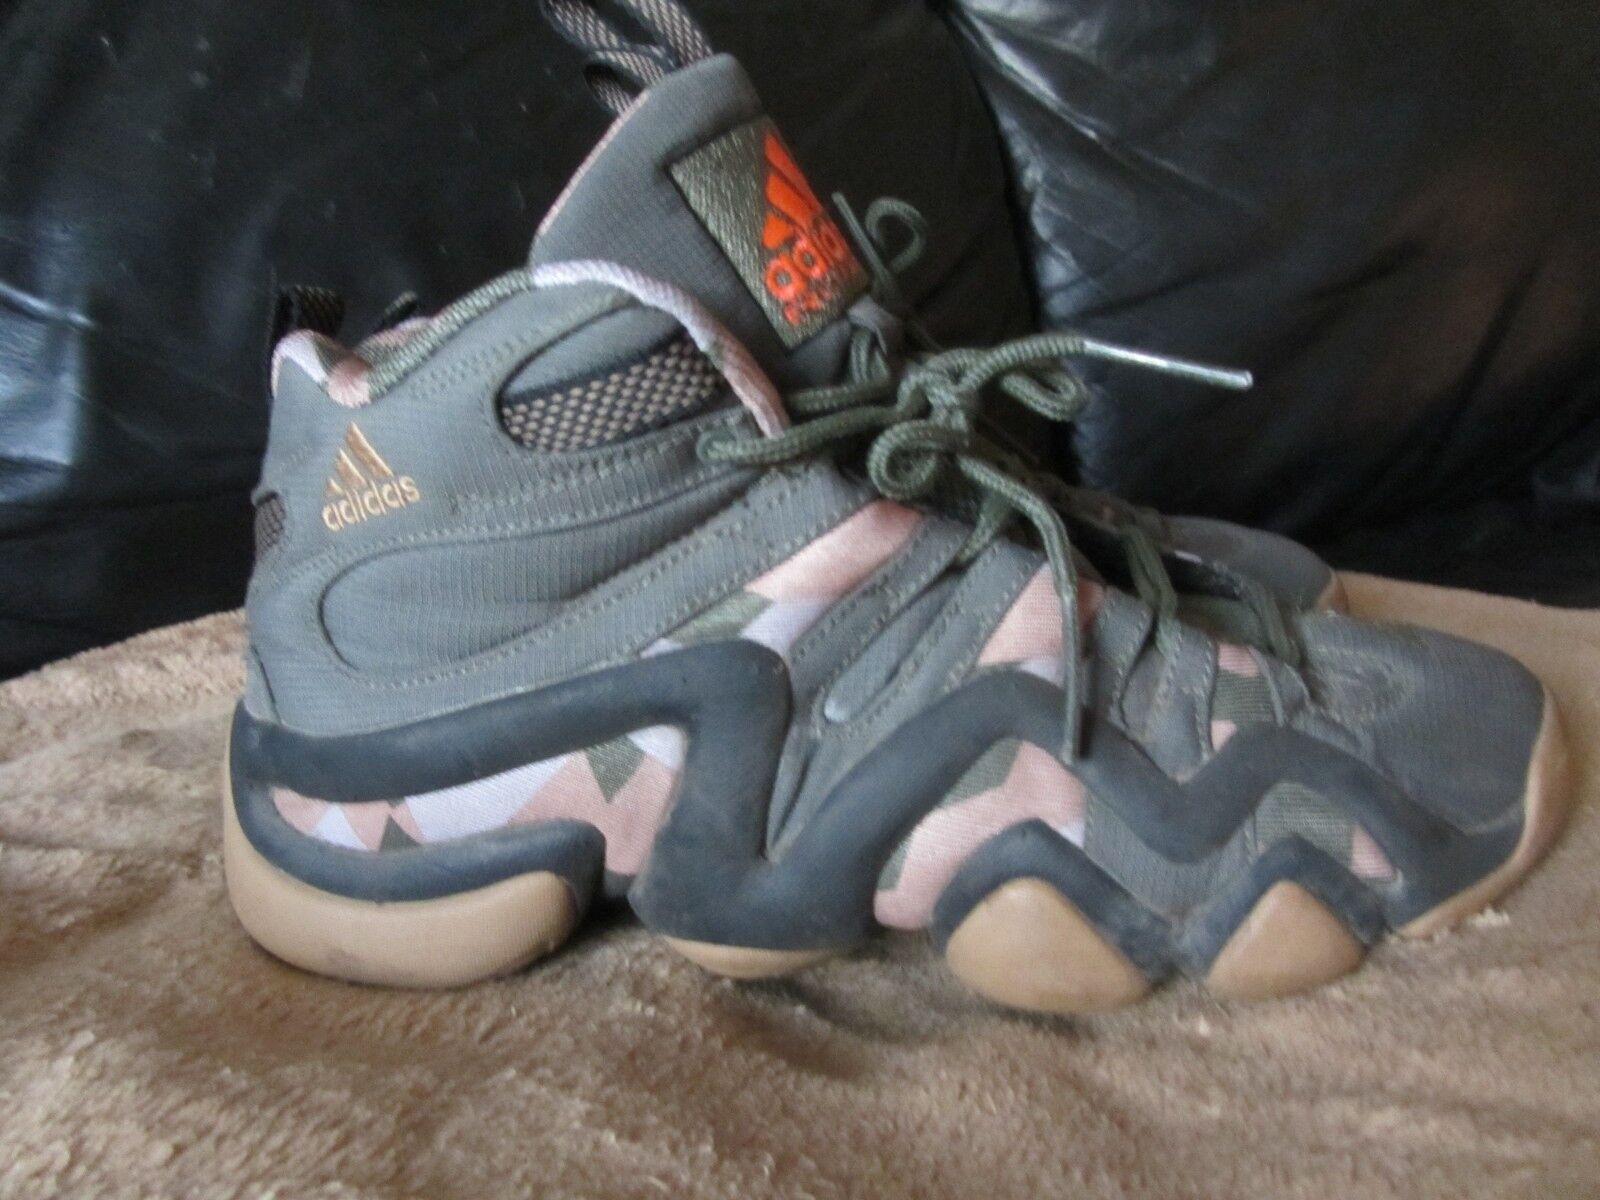 Adidas Men's Crazy 8 Basketball shoes S84003 size 8.5